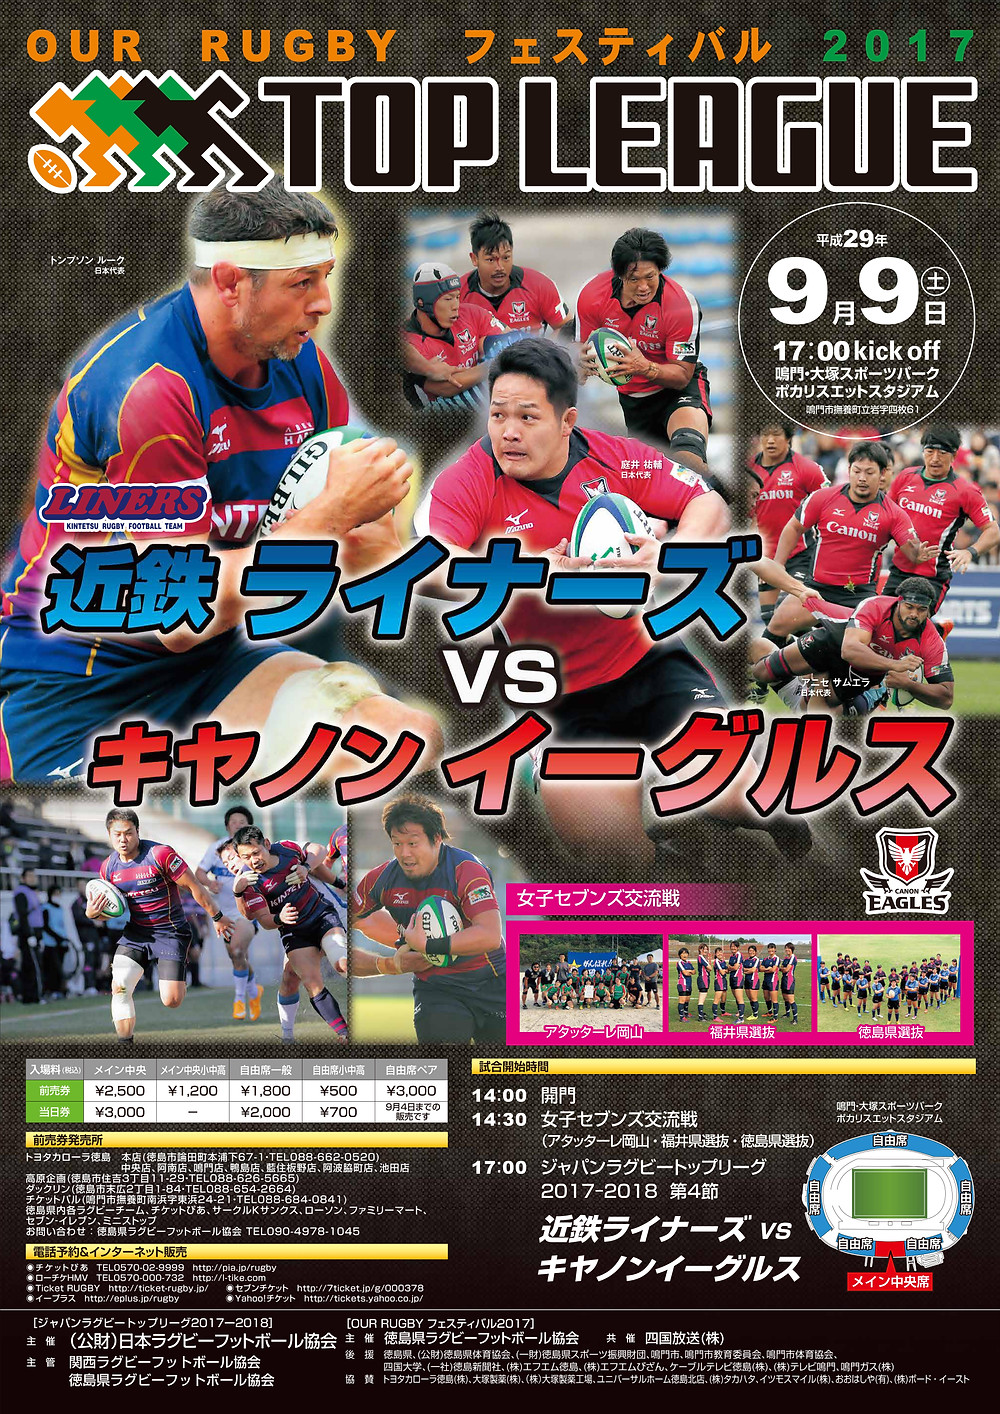 our rugby フェスティバル TOP LEAGUE トップリーグ 2017 近鉄 キャノン 鳴門・大塚スポーツパーク ポカリスエットスタジアム